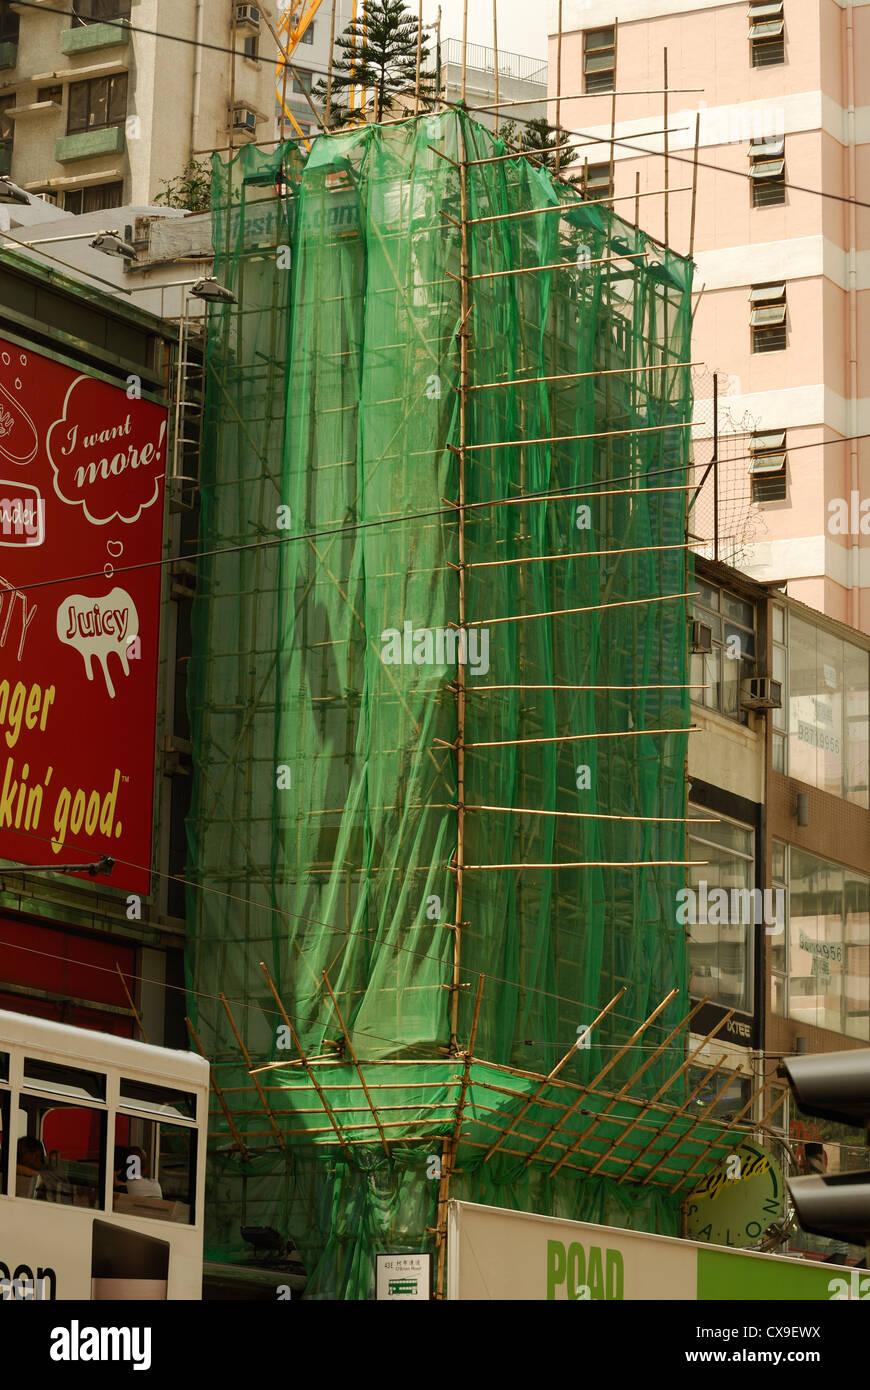 Bamboo scaffolding draped in netting enclose this Hong Kong building. - Stock Image